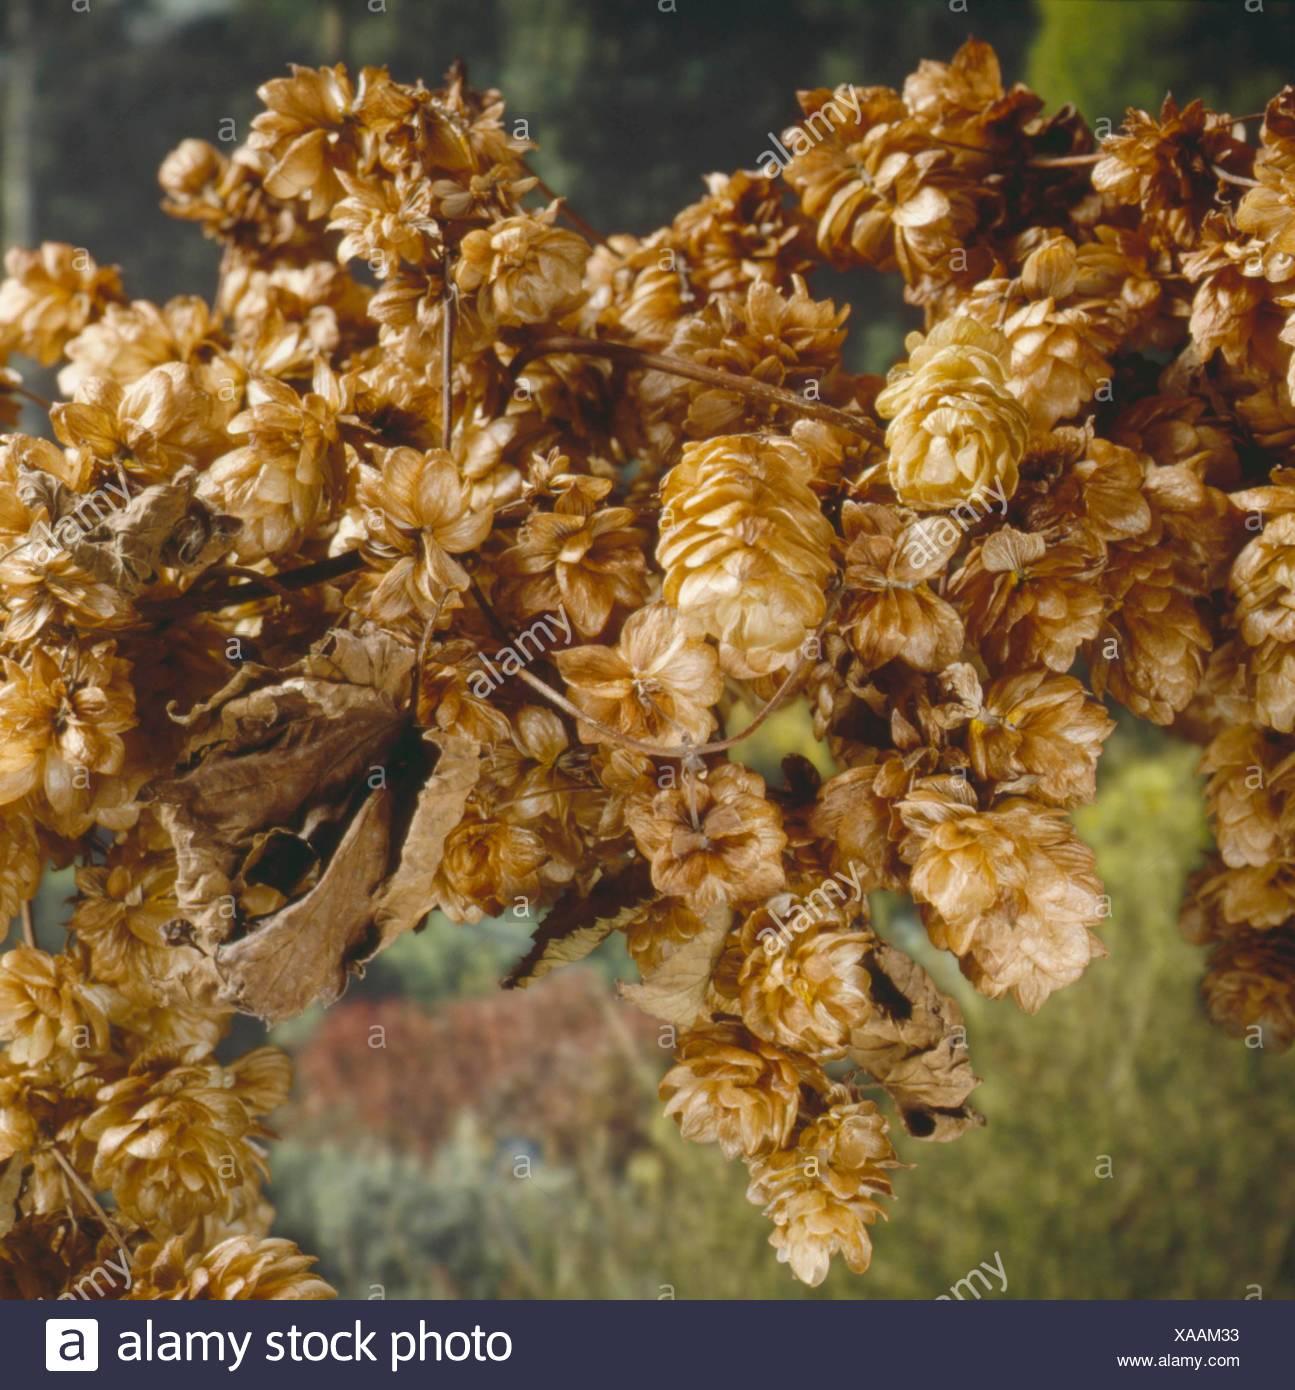 Dried Plants - Hops (Humulus lupulus)   DRI052912 - Stock Image